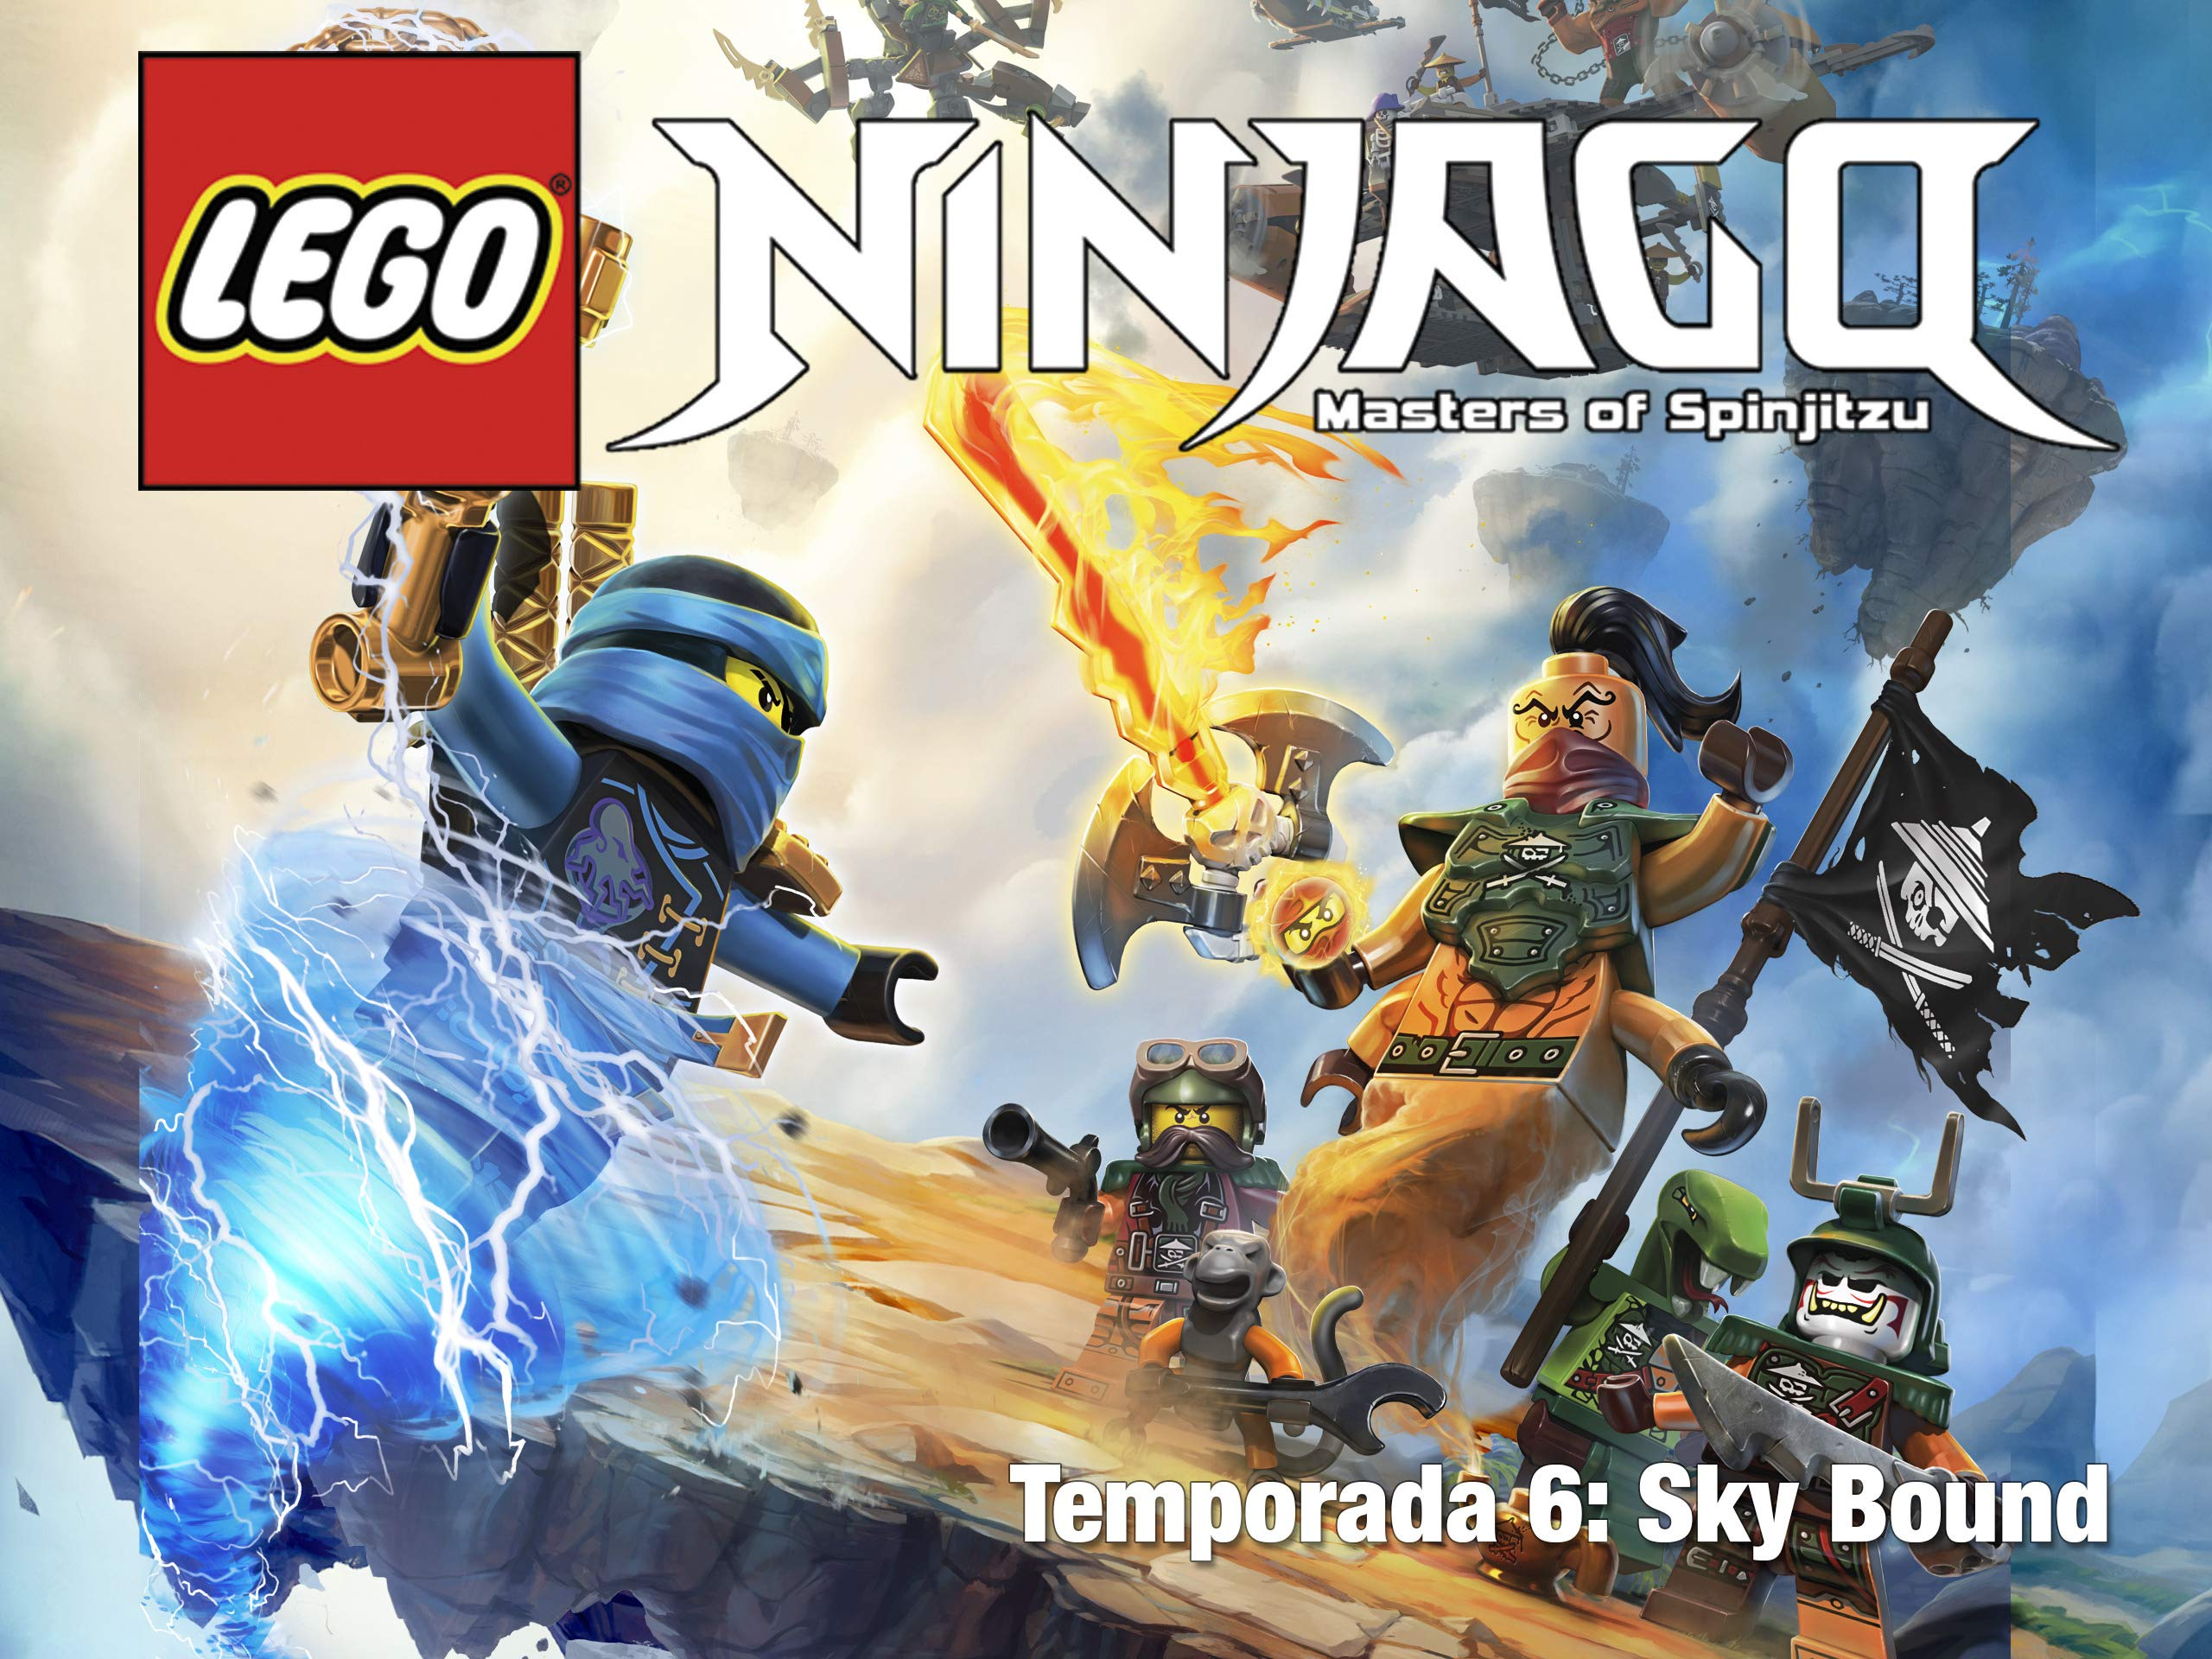 Amazon.com: Watch LEGO Ninjago